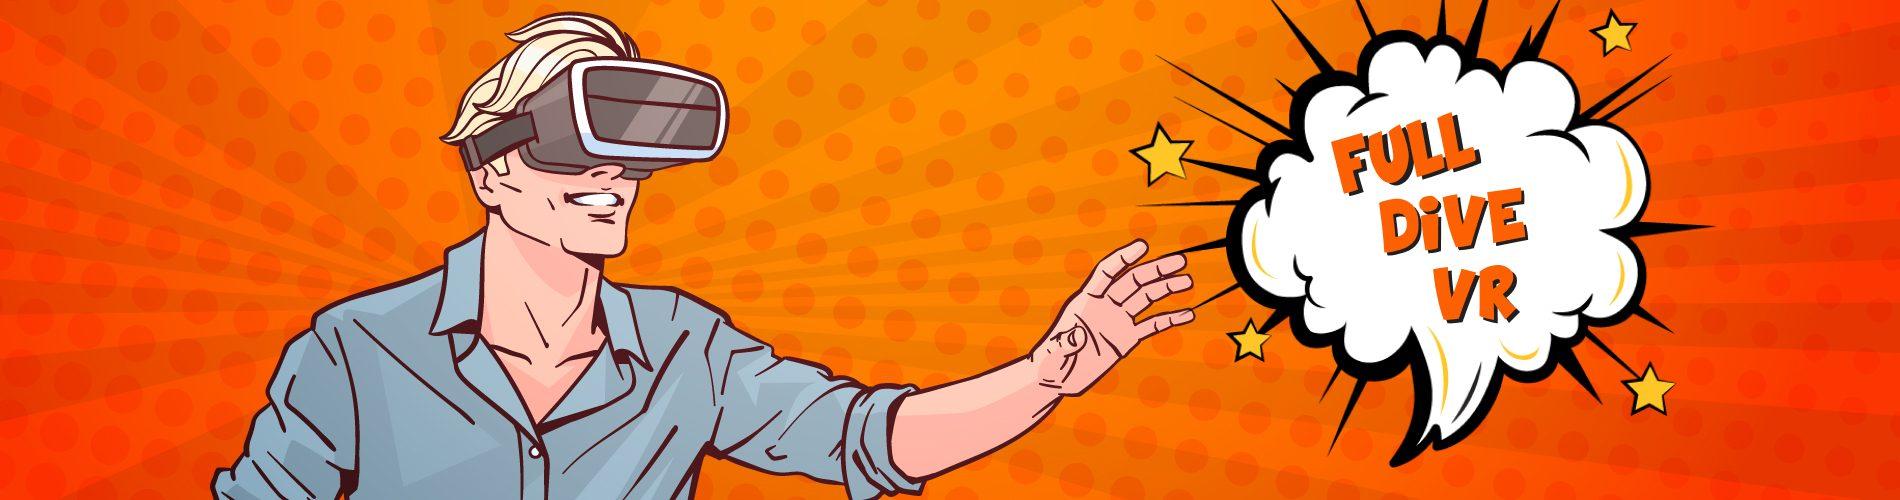 full dive virtual reality